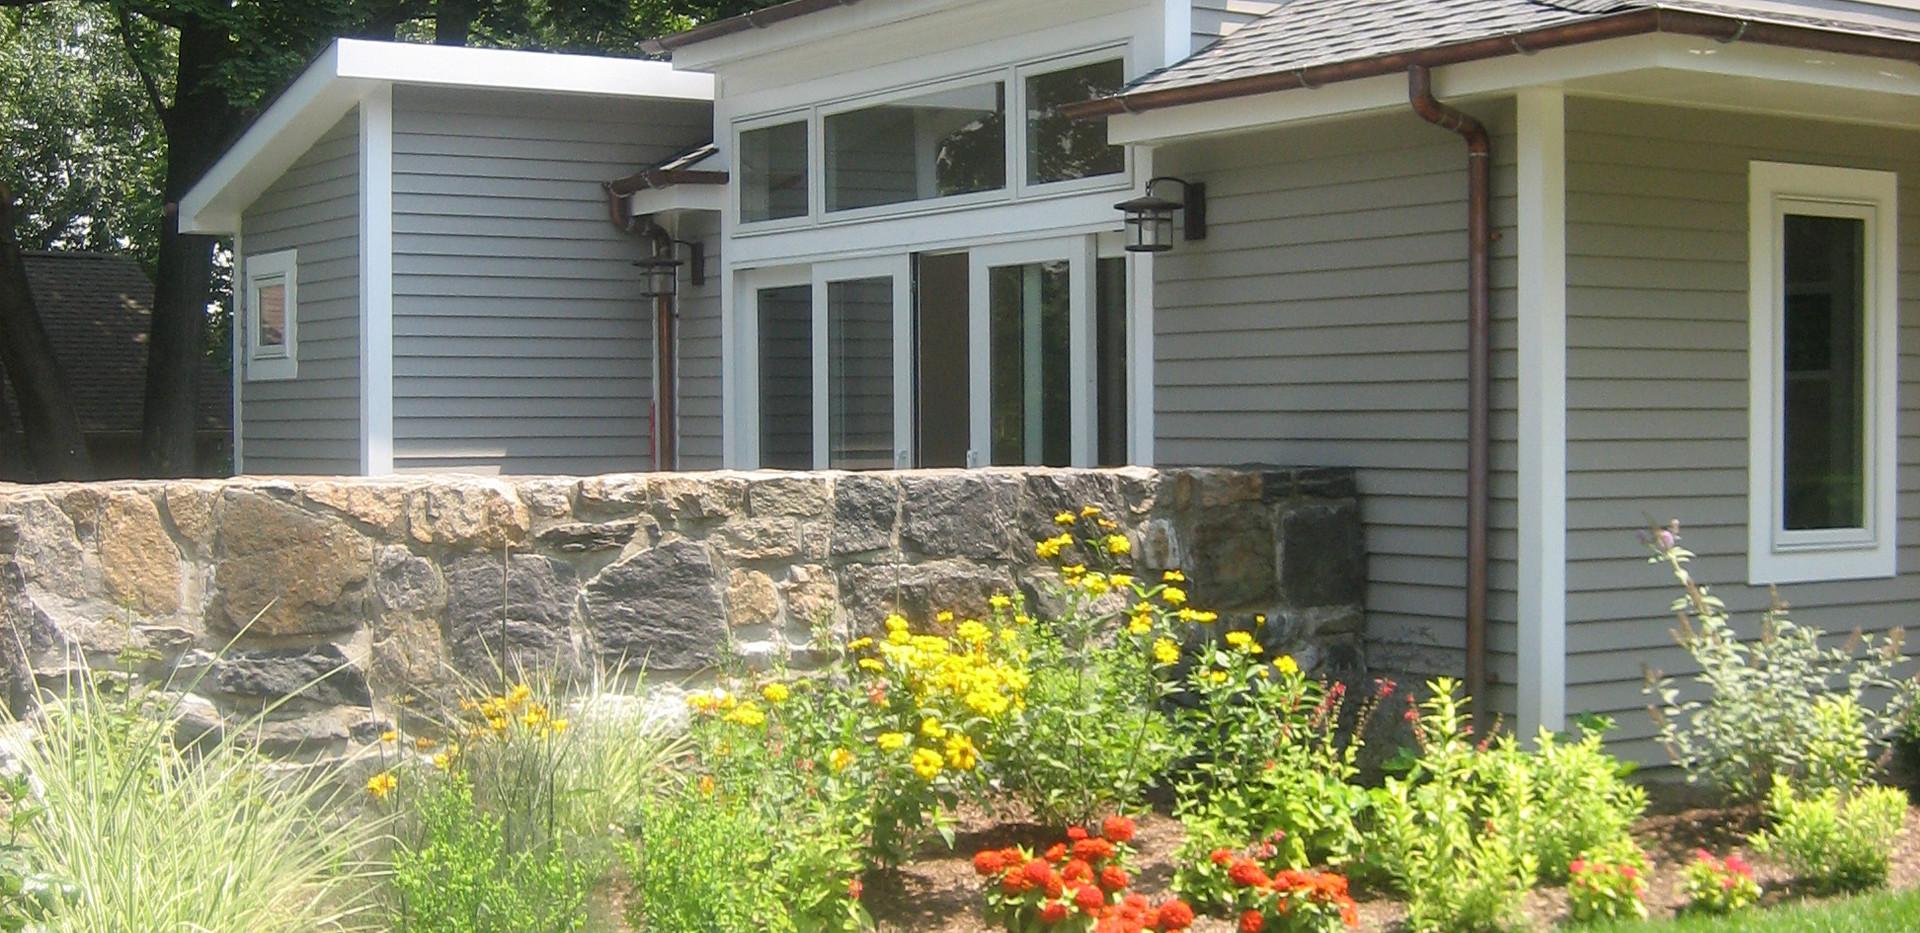 The pool house garden approach